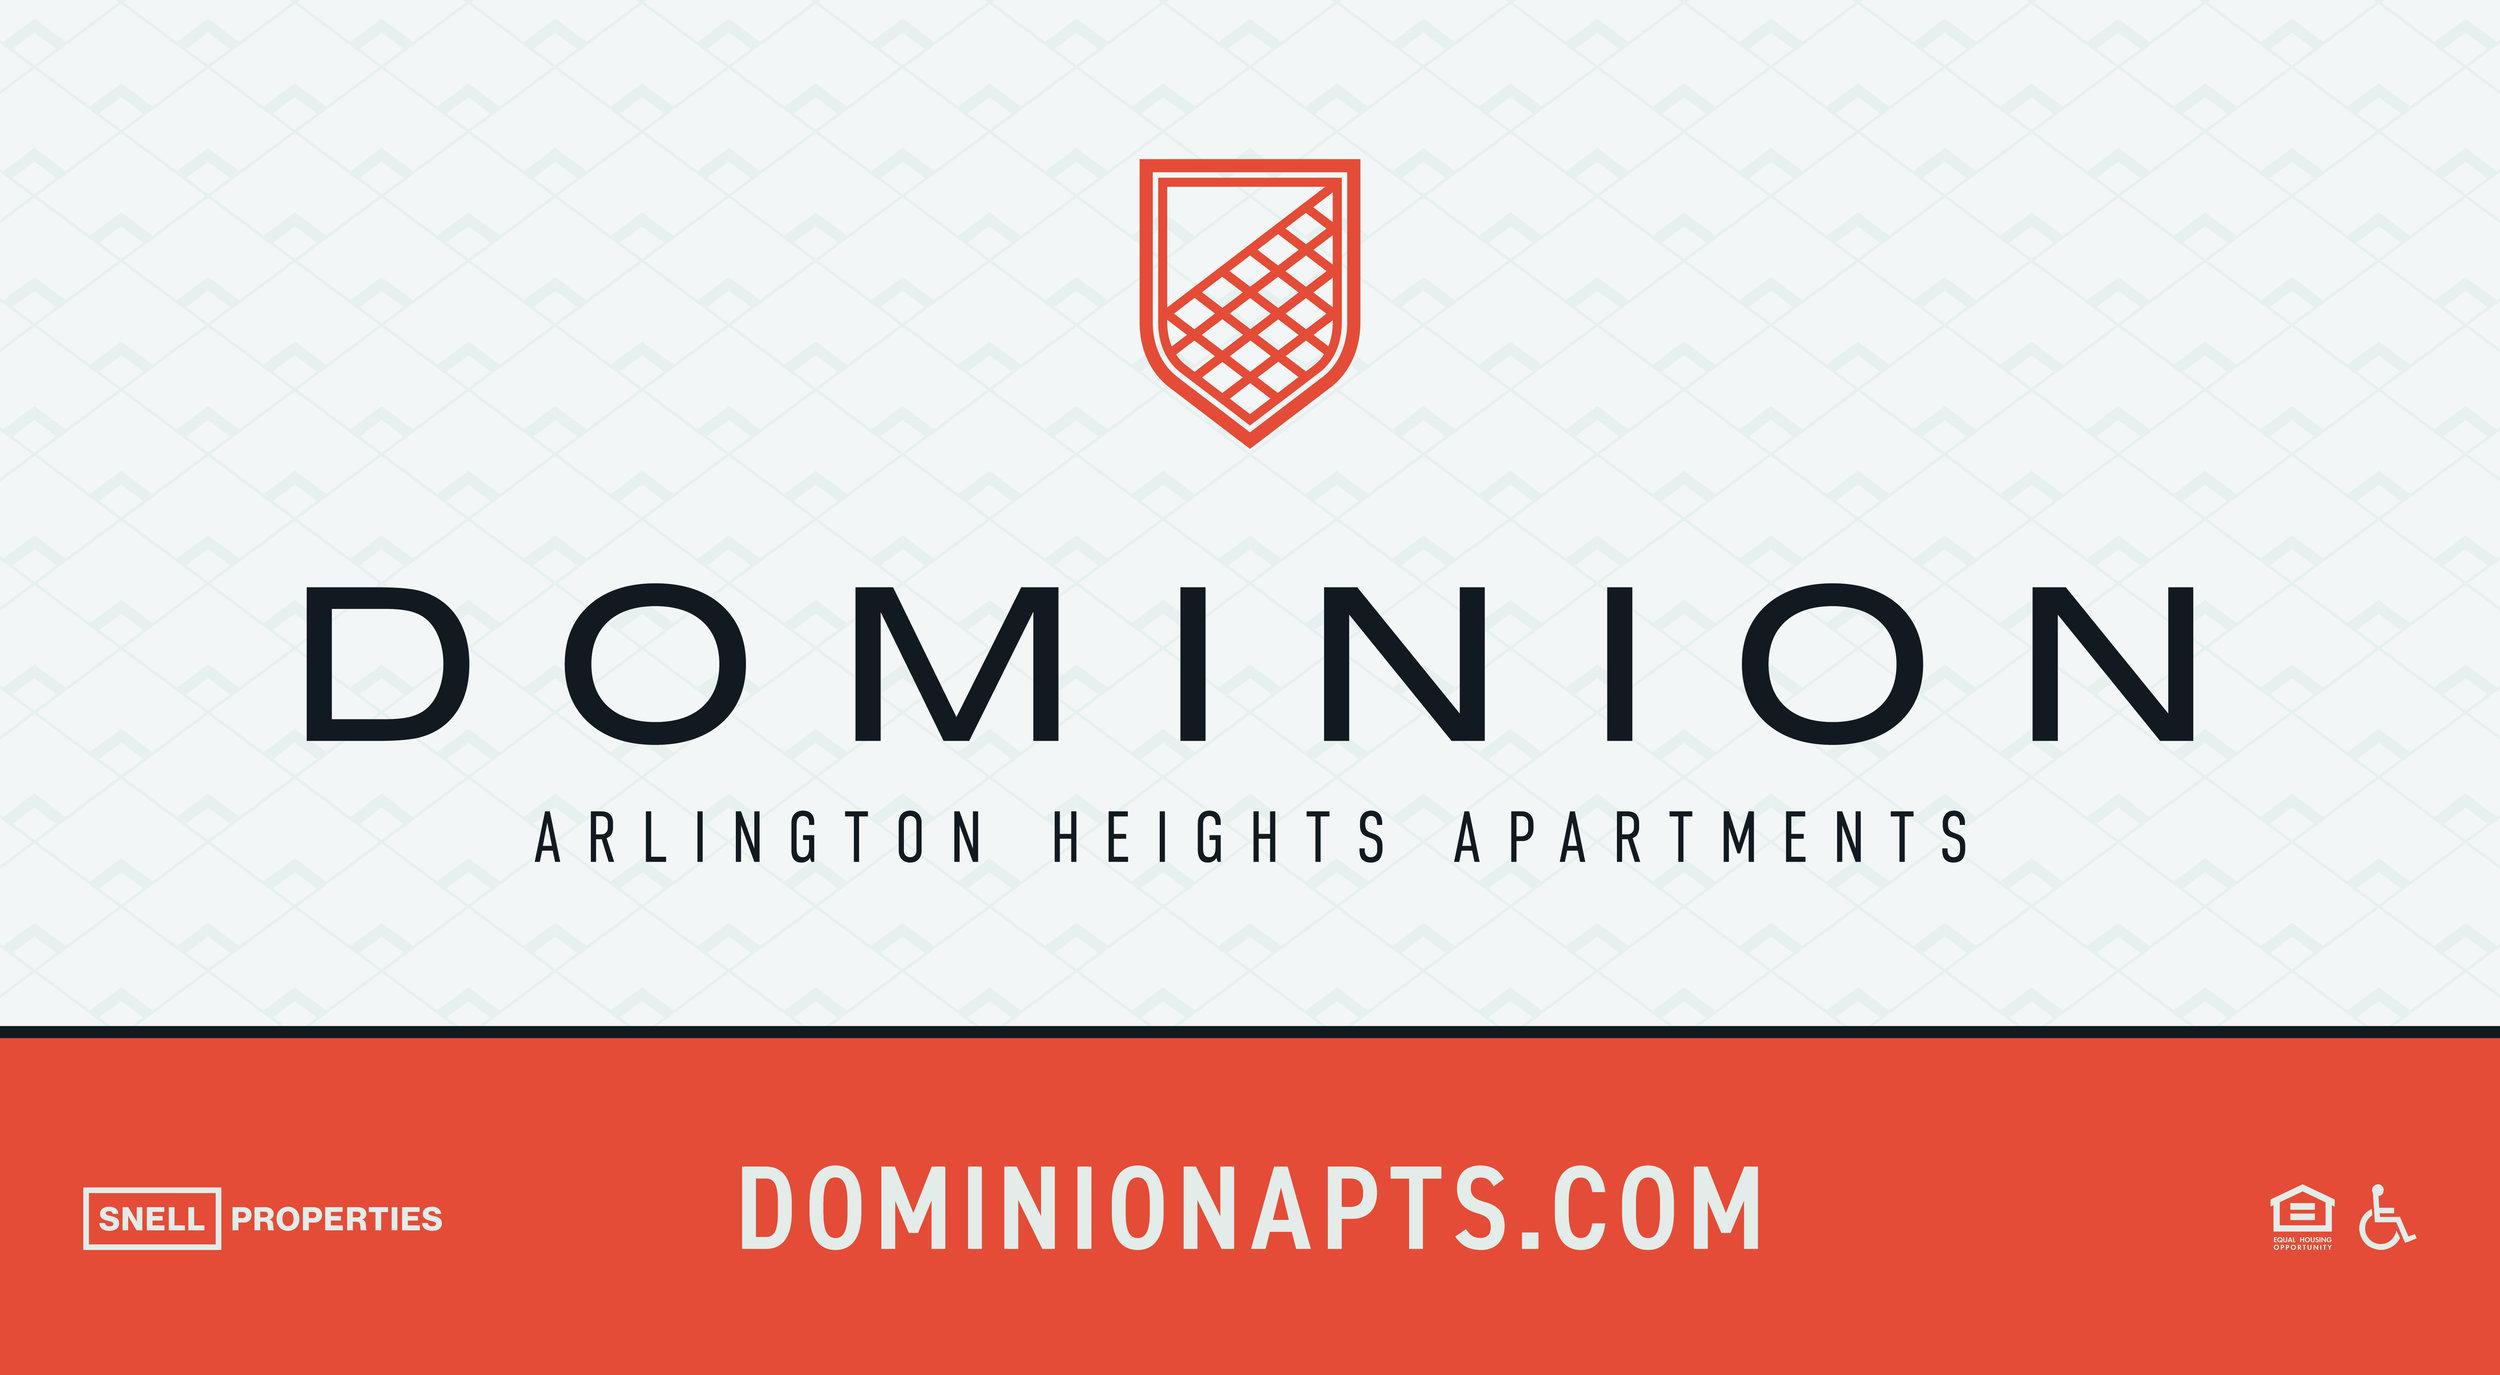 Dominion_FenceBanners.jpg